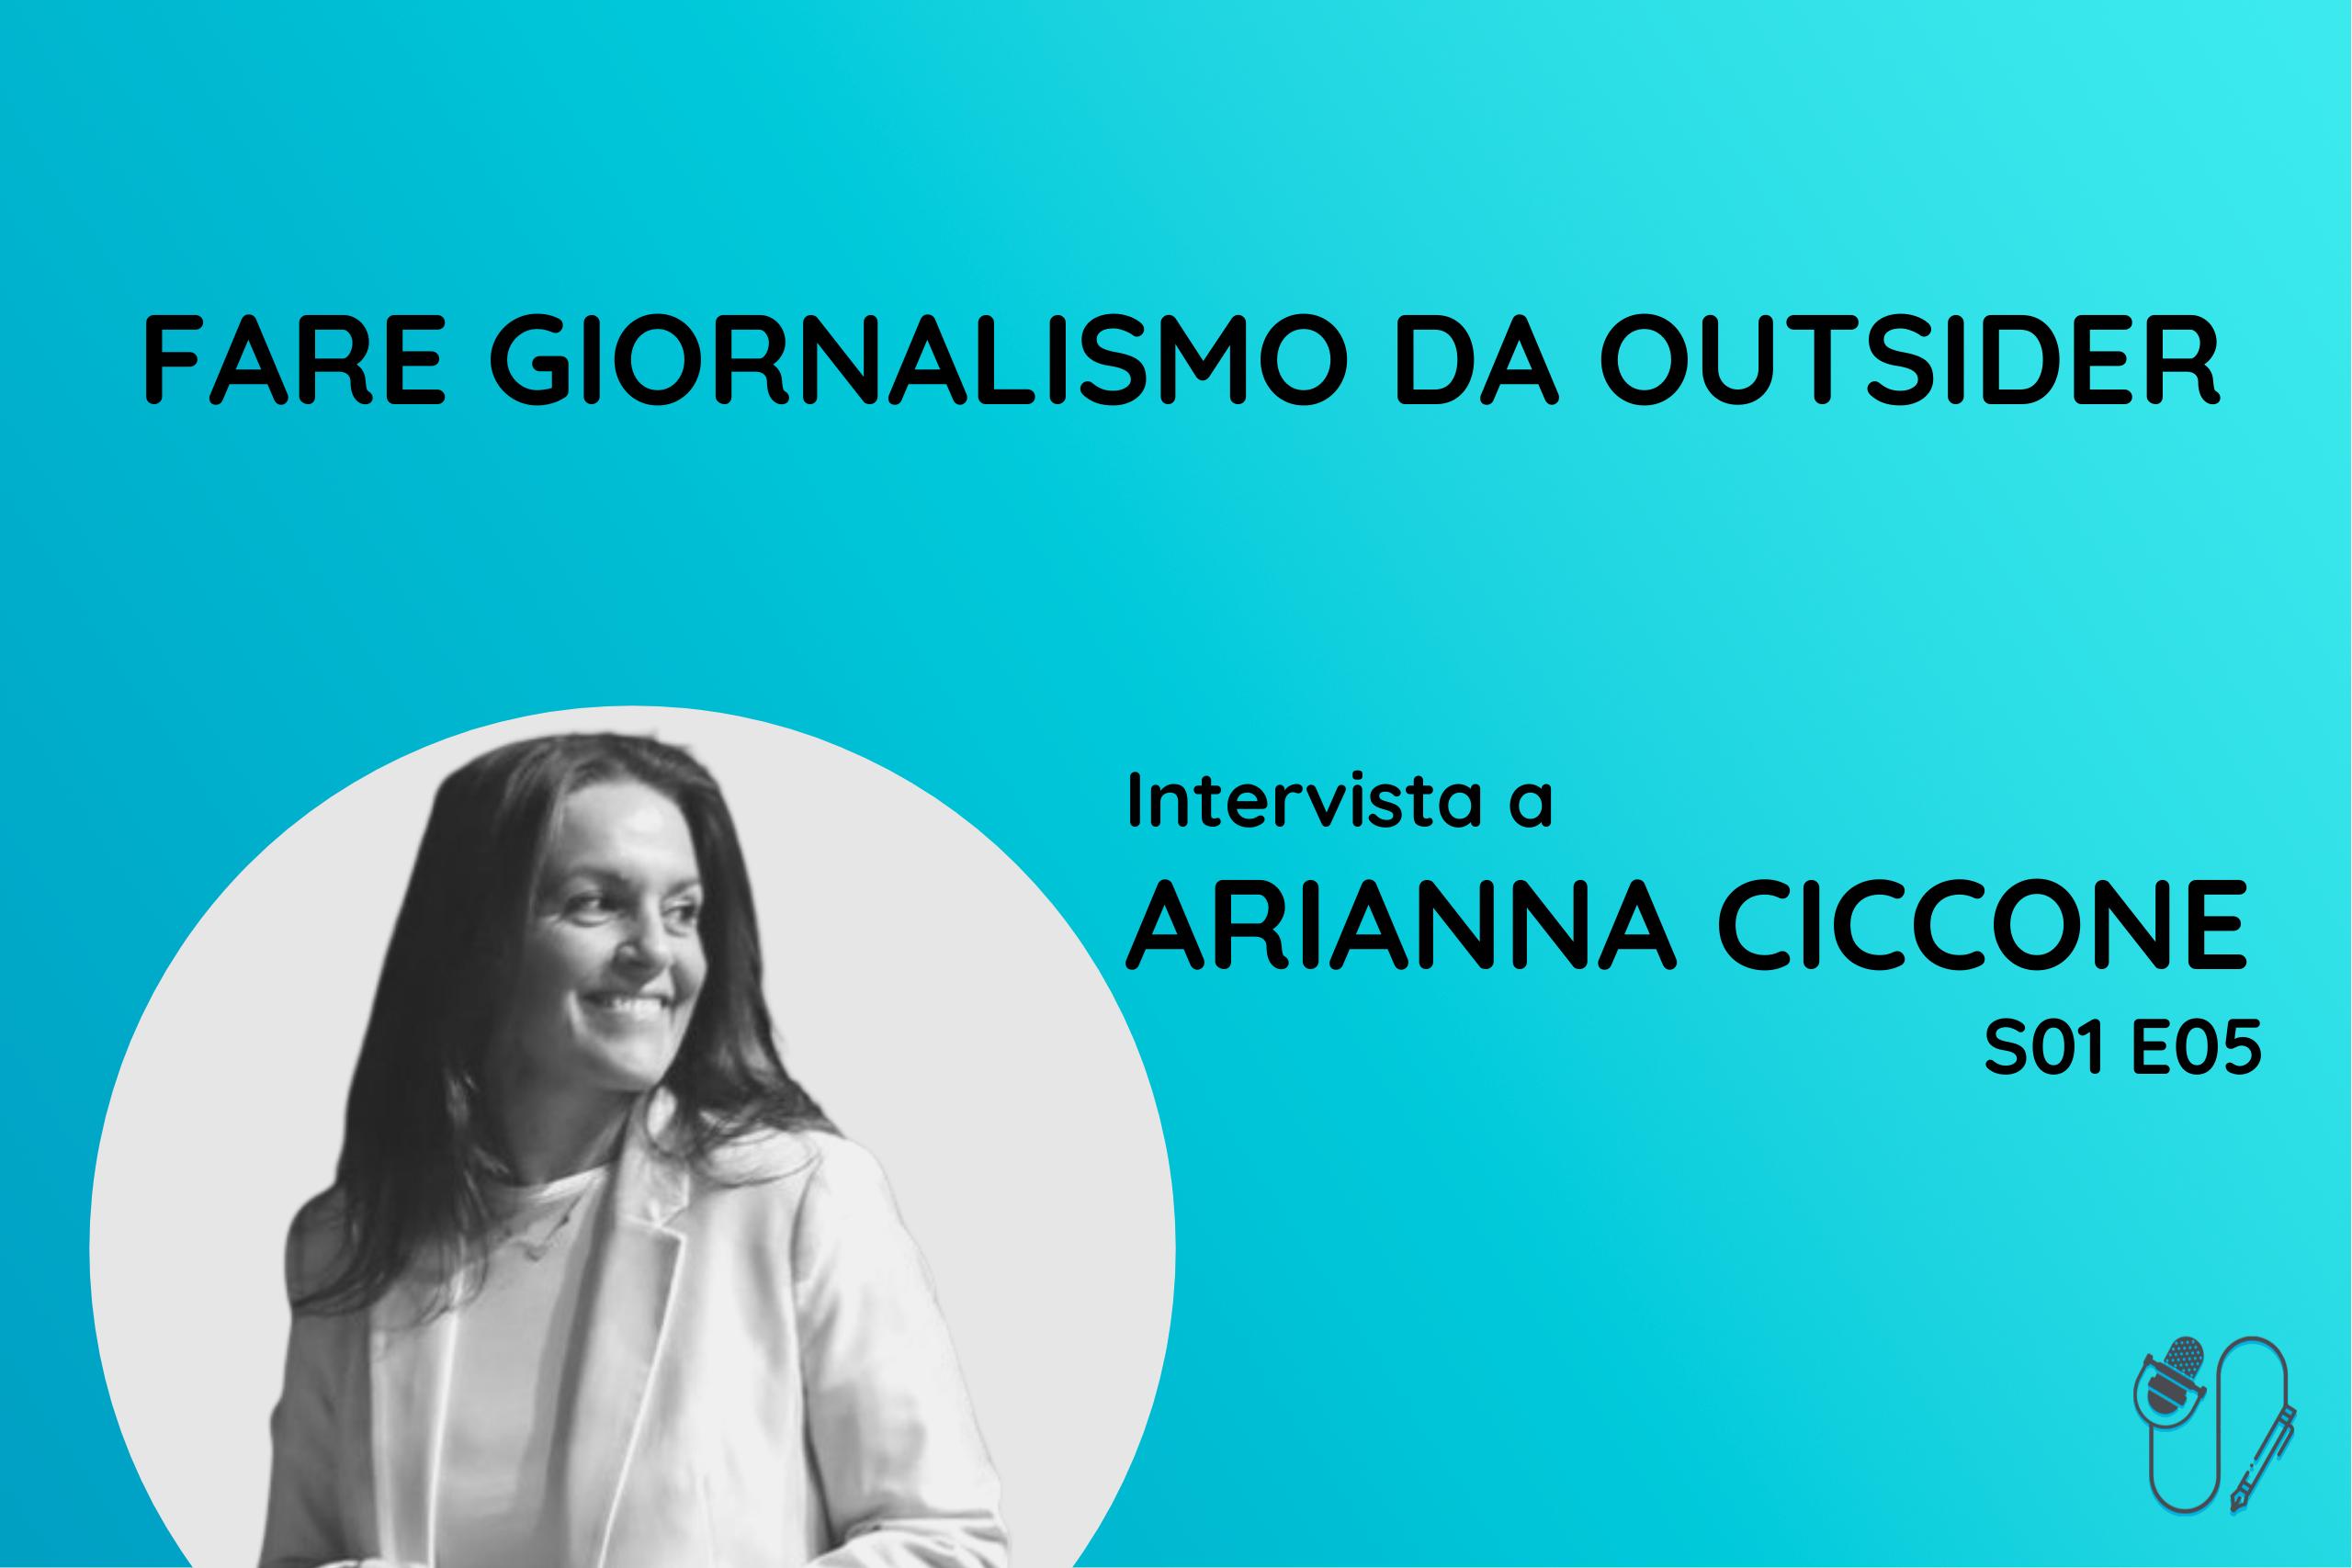 Arianna Ciccone